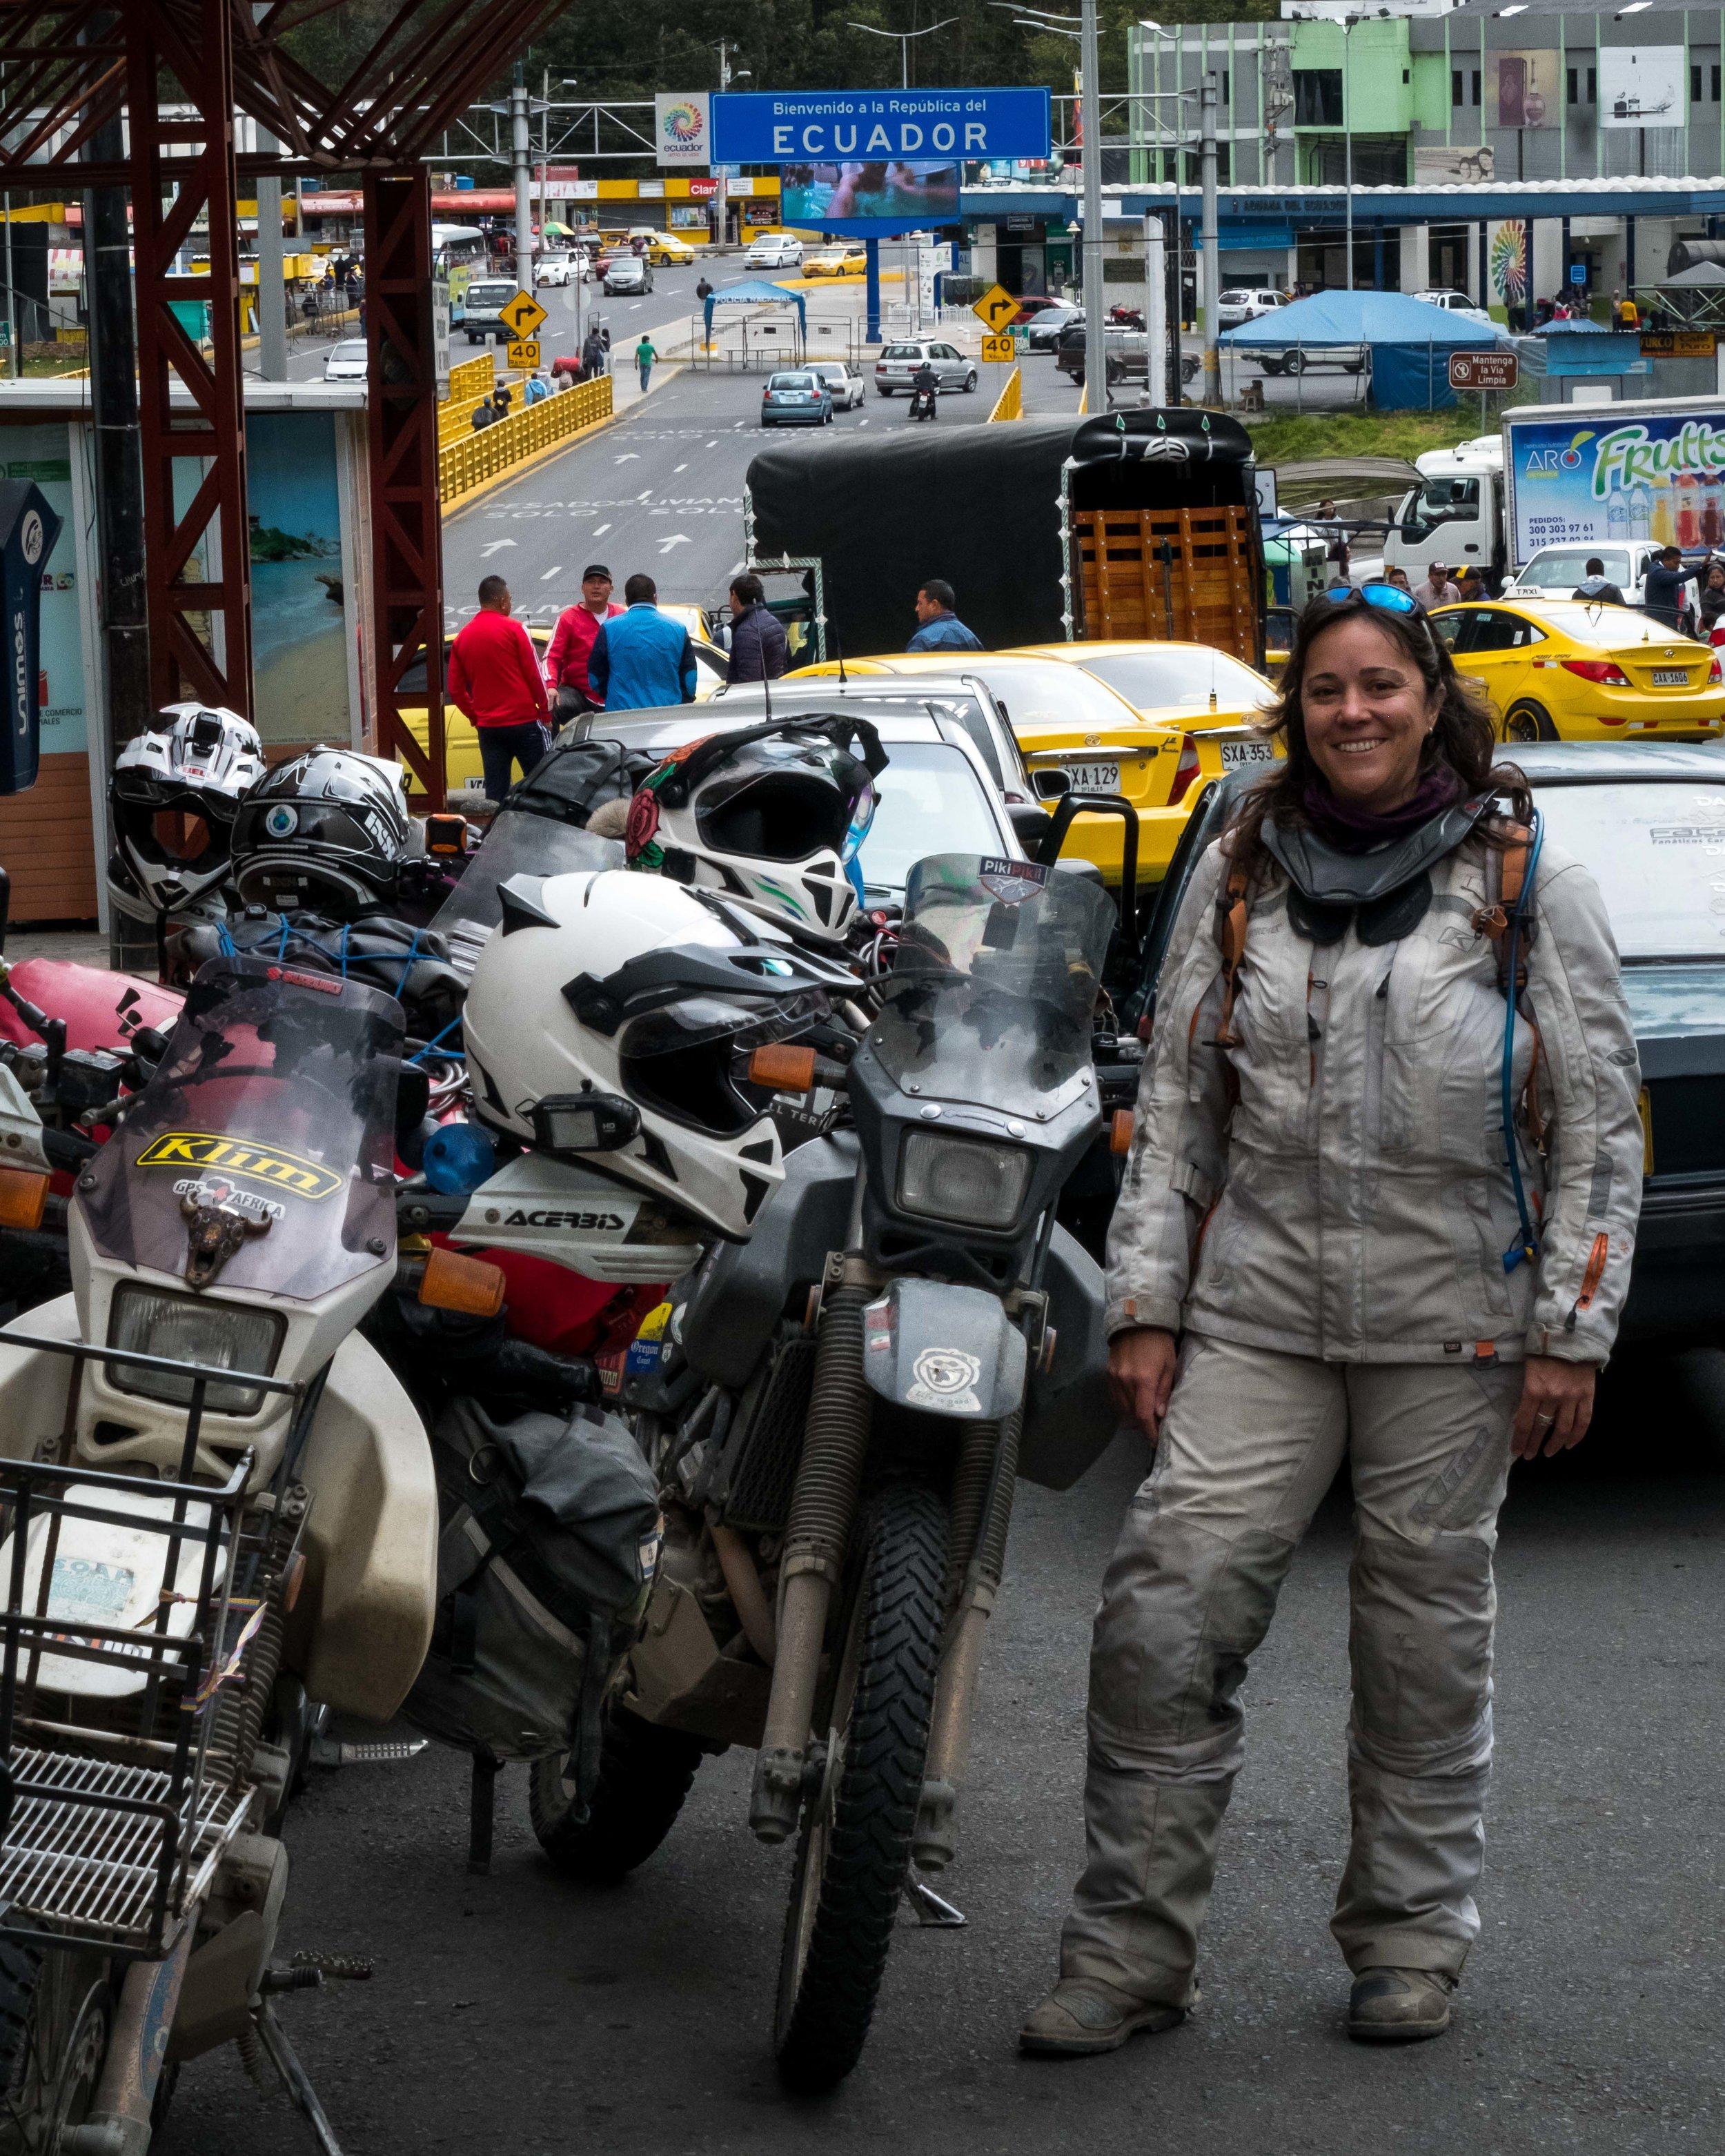 michnus-elsebie-olivier-pikipiki-overland-adventure-rider-radio-motorcycle-podcast-7.jpg